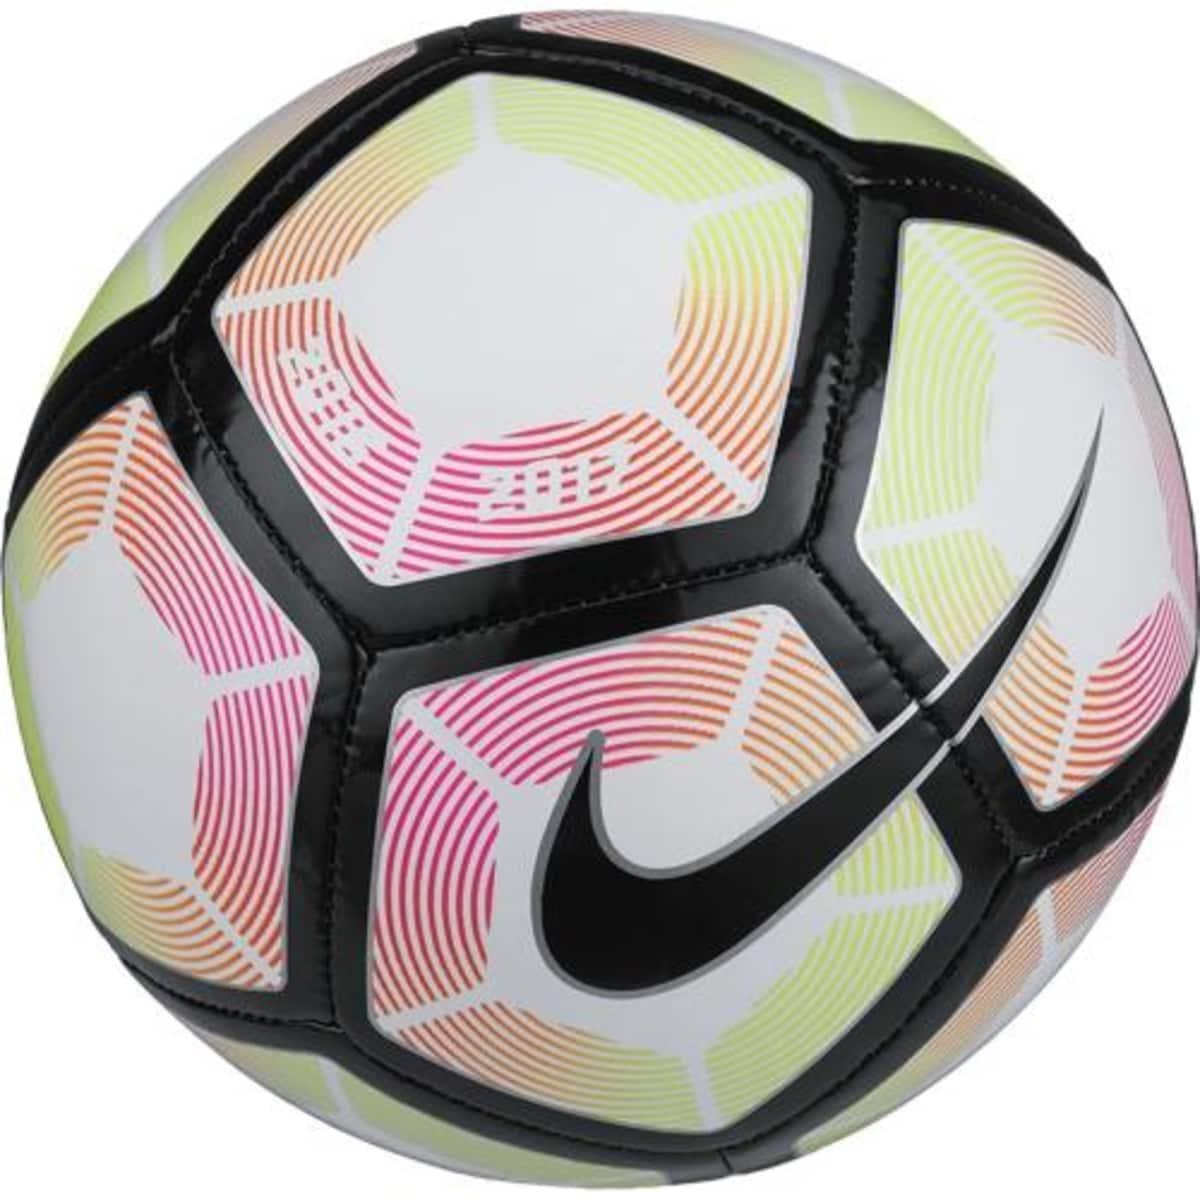 Soccer Balls Sportsmans Warehouse Bola Sepak Original Product Image